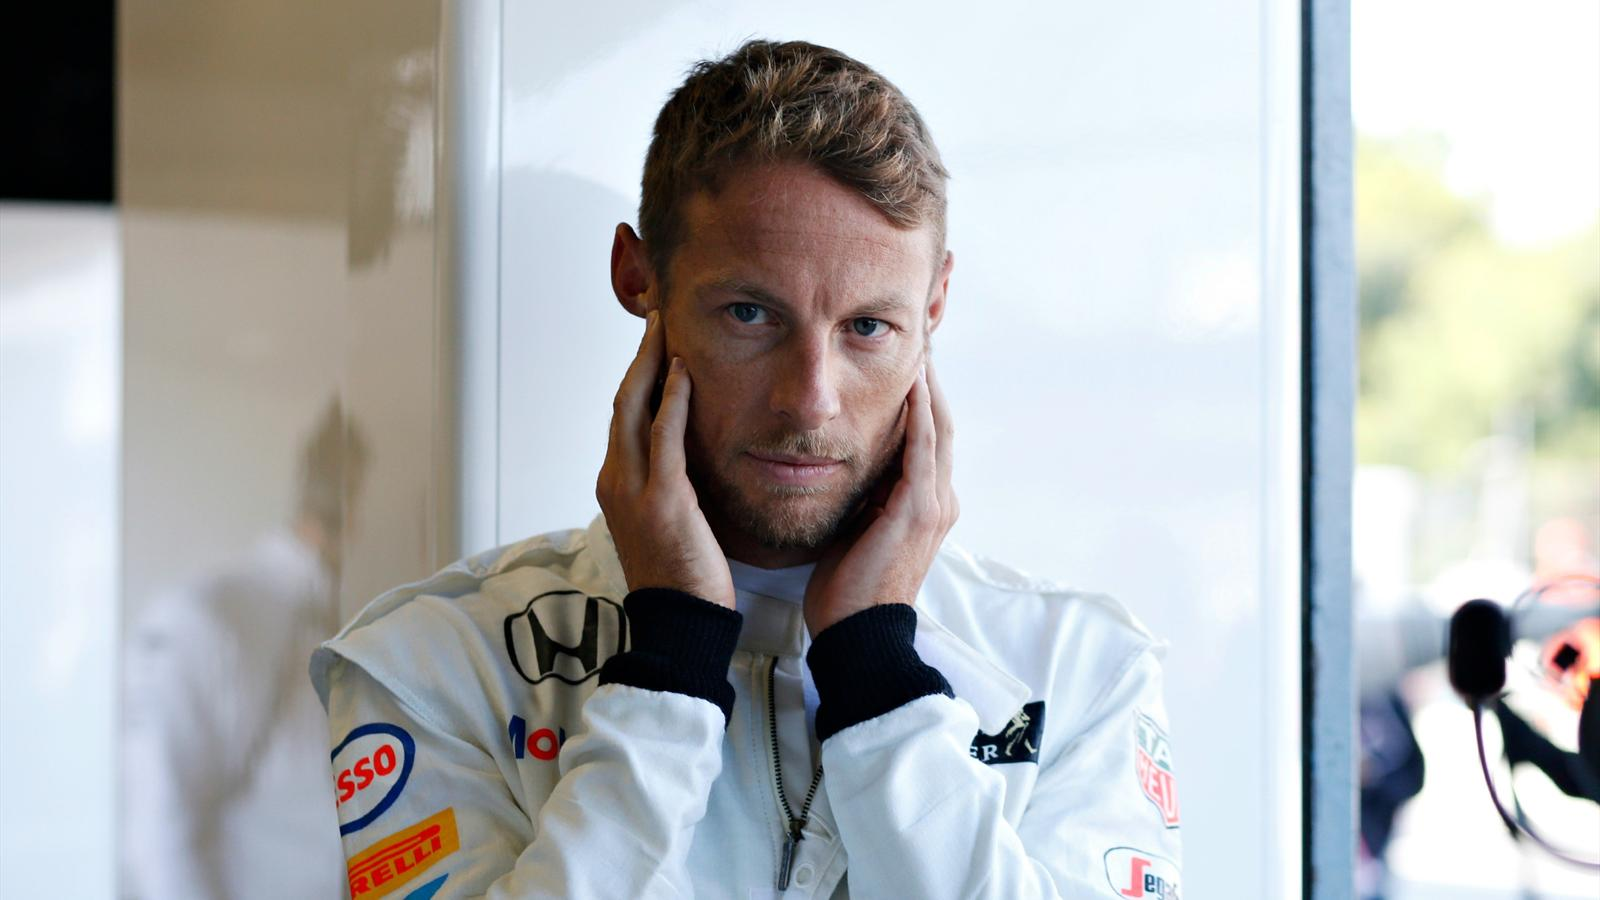 Jenson Button (McLaren) au Grand Prix d'Italie 2015